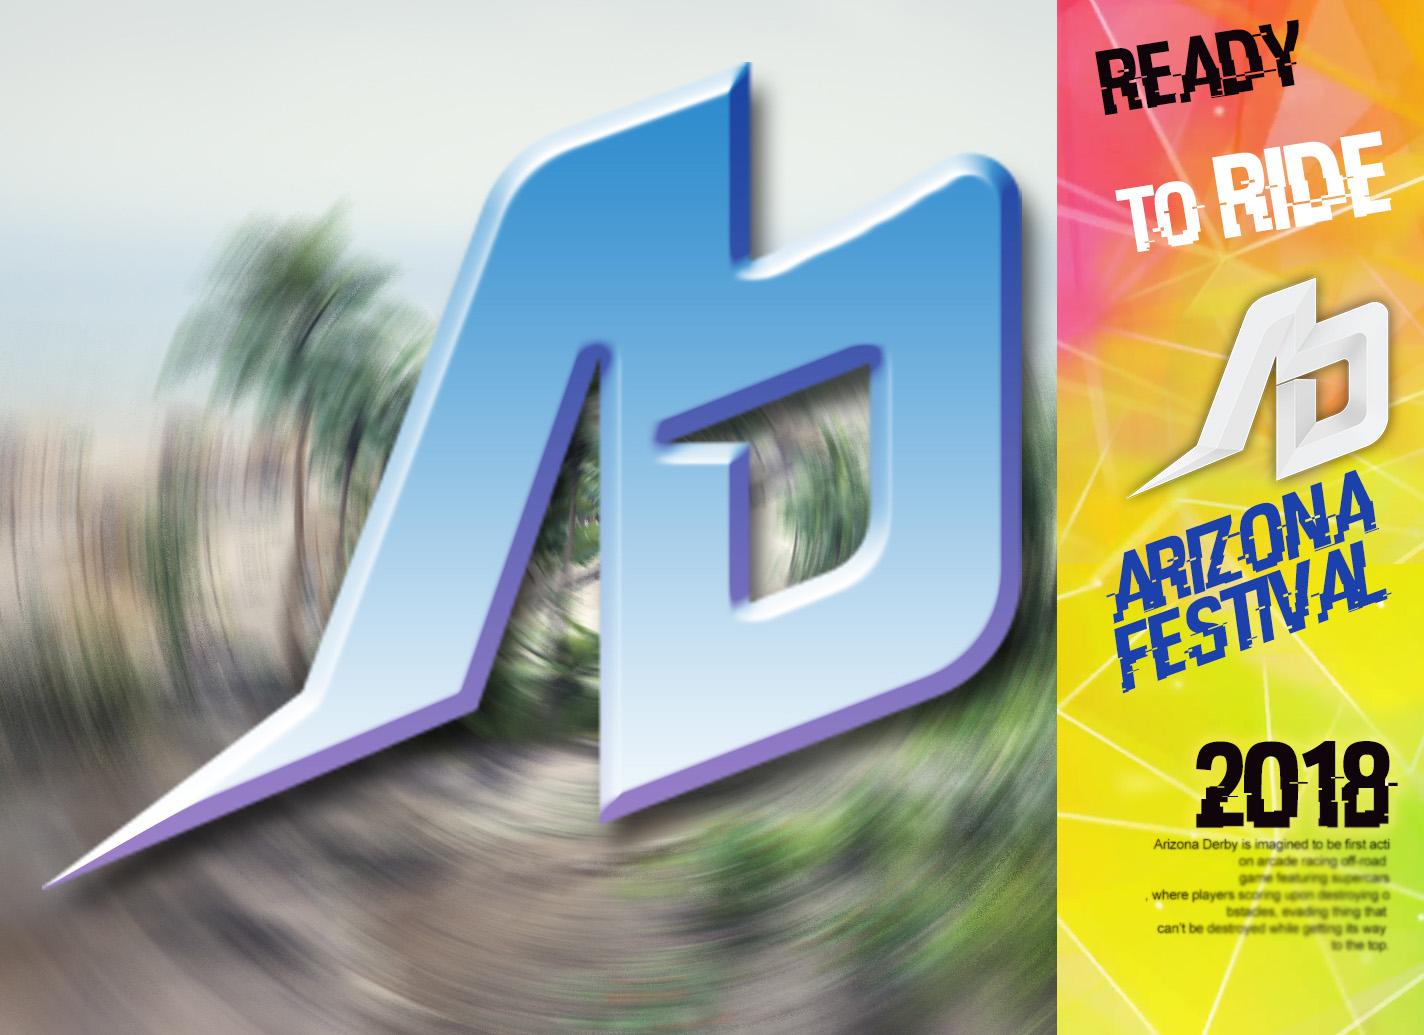 ArizoneFestival